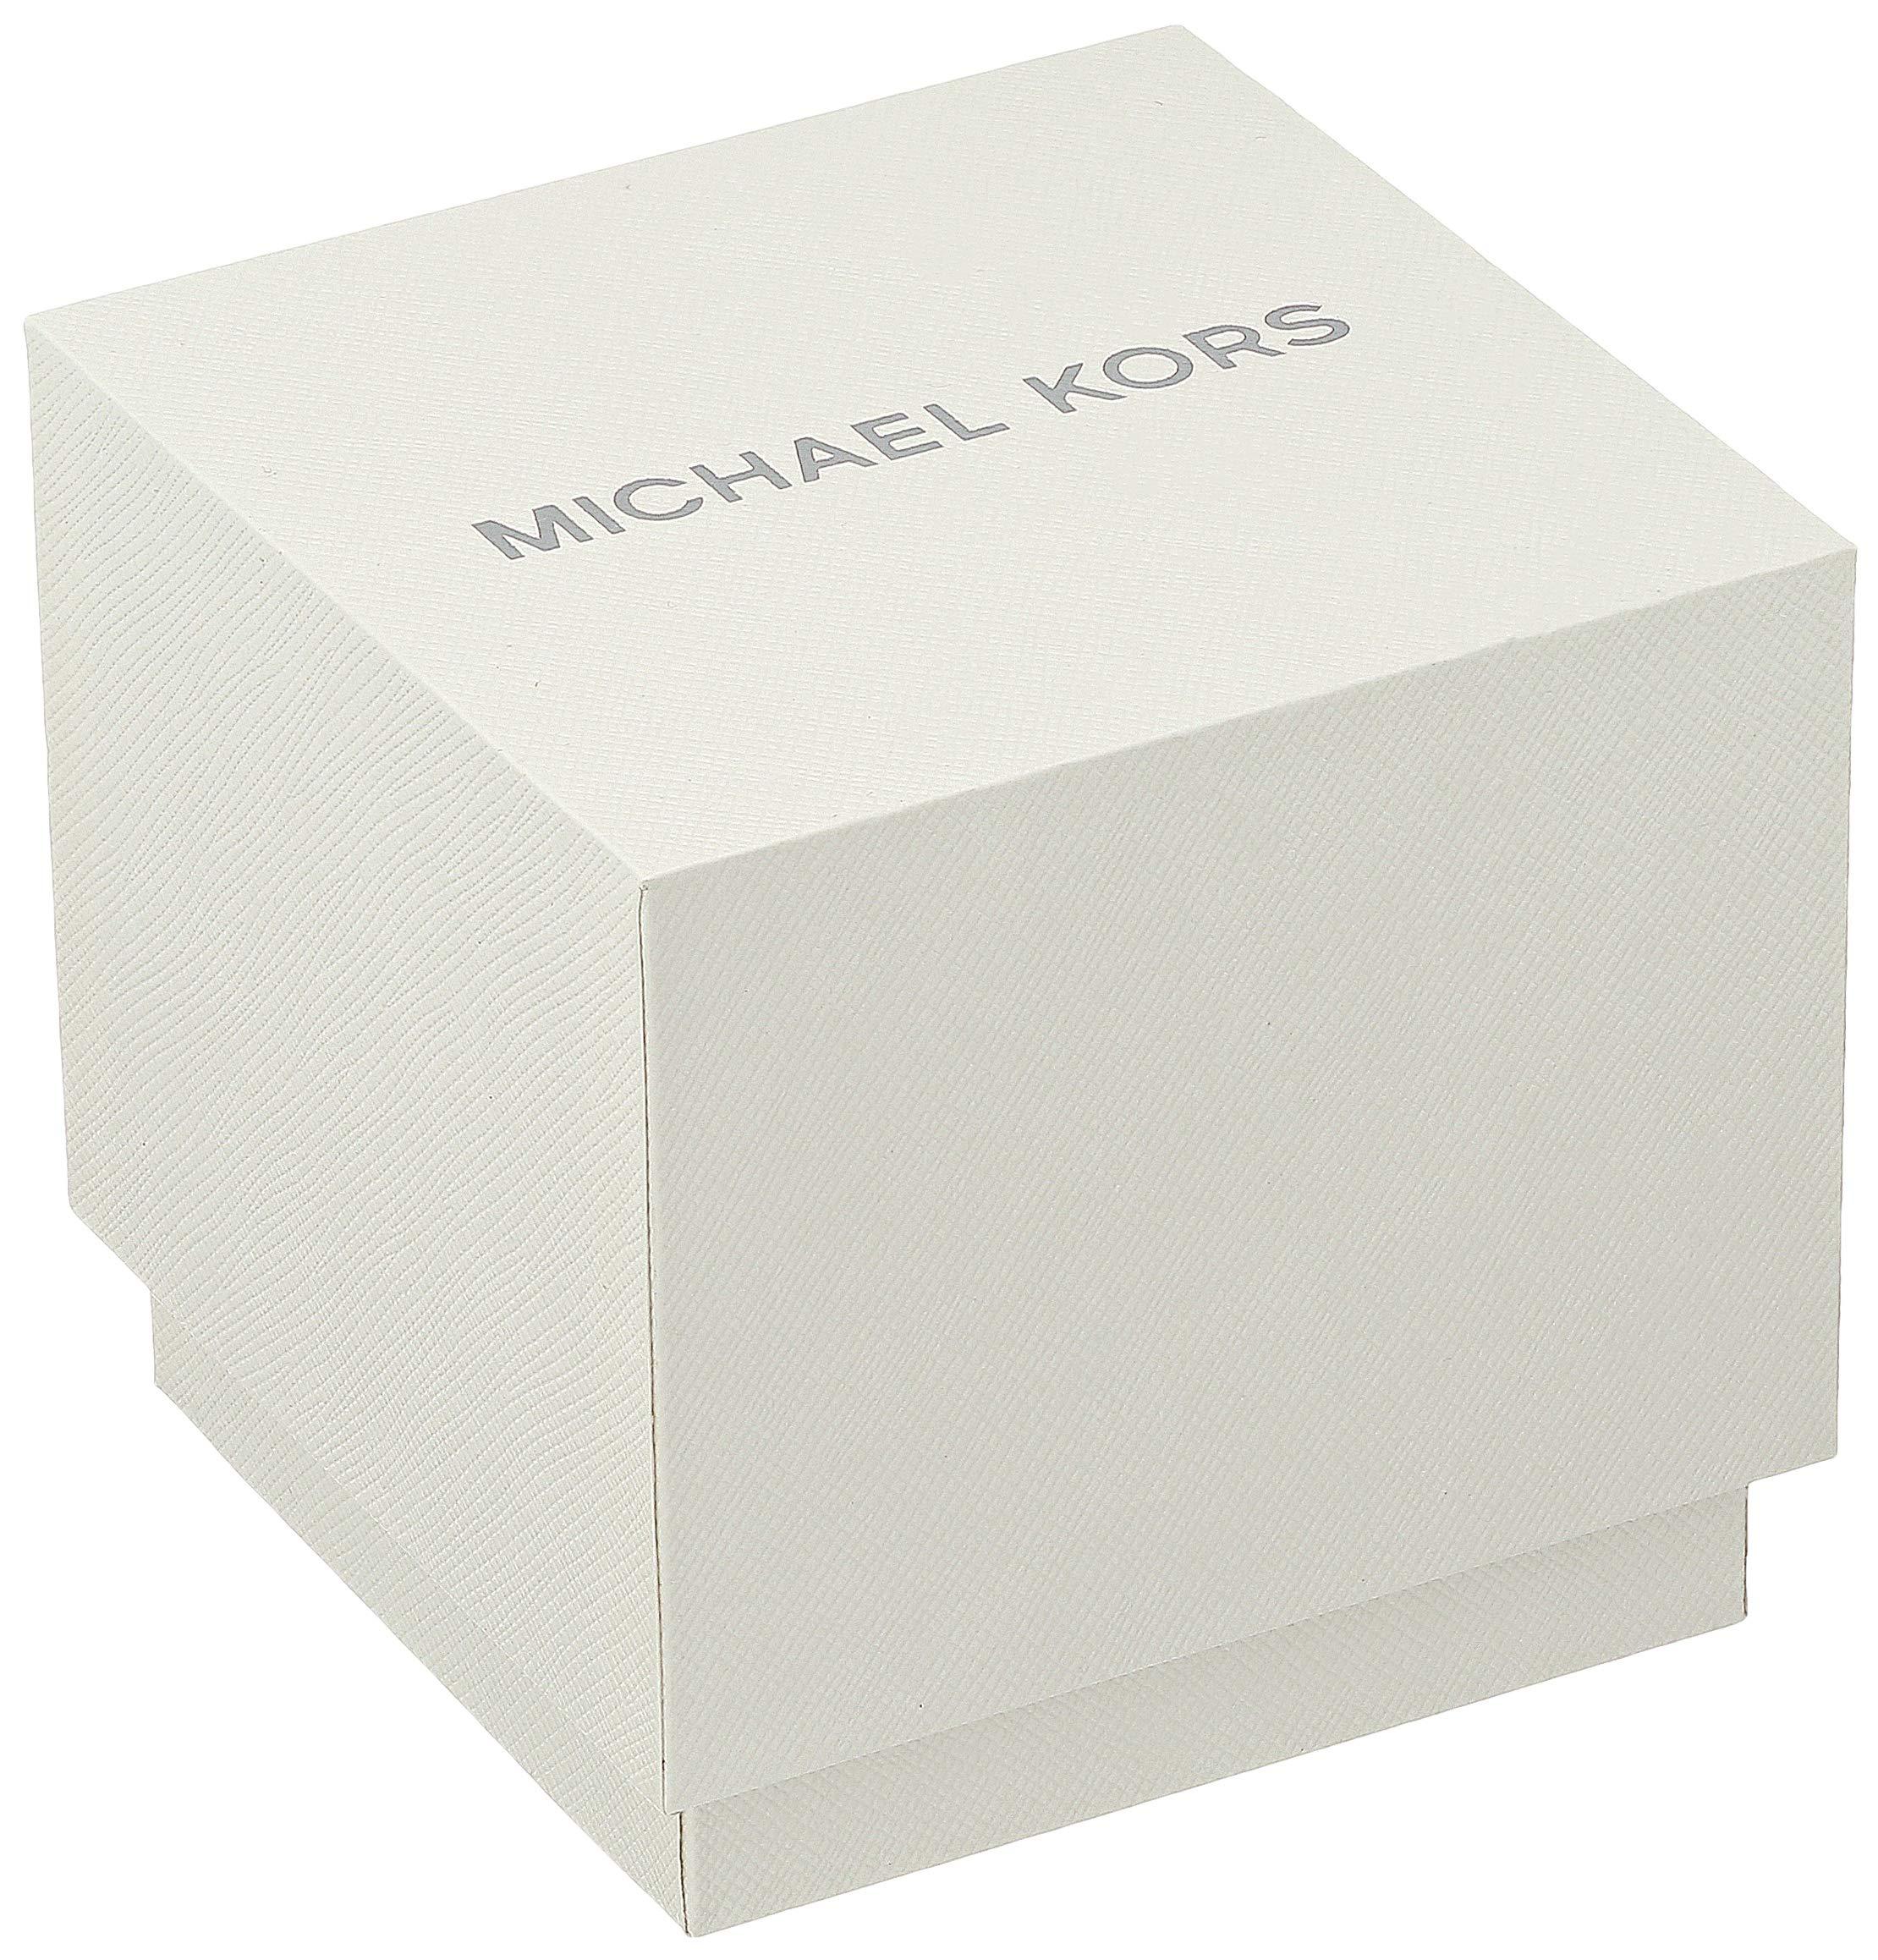 Michael-Kors-Damen-Analog-Quarz-Uhr-mit-Edelstahl-Armband-MK3981